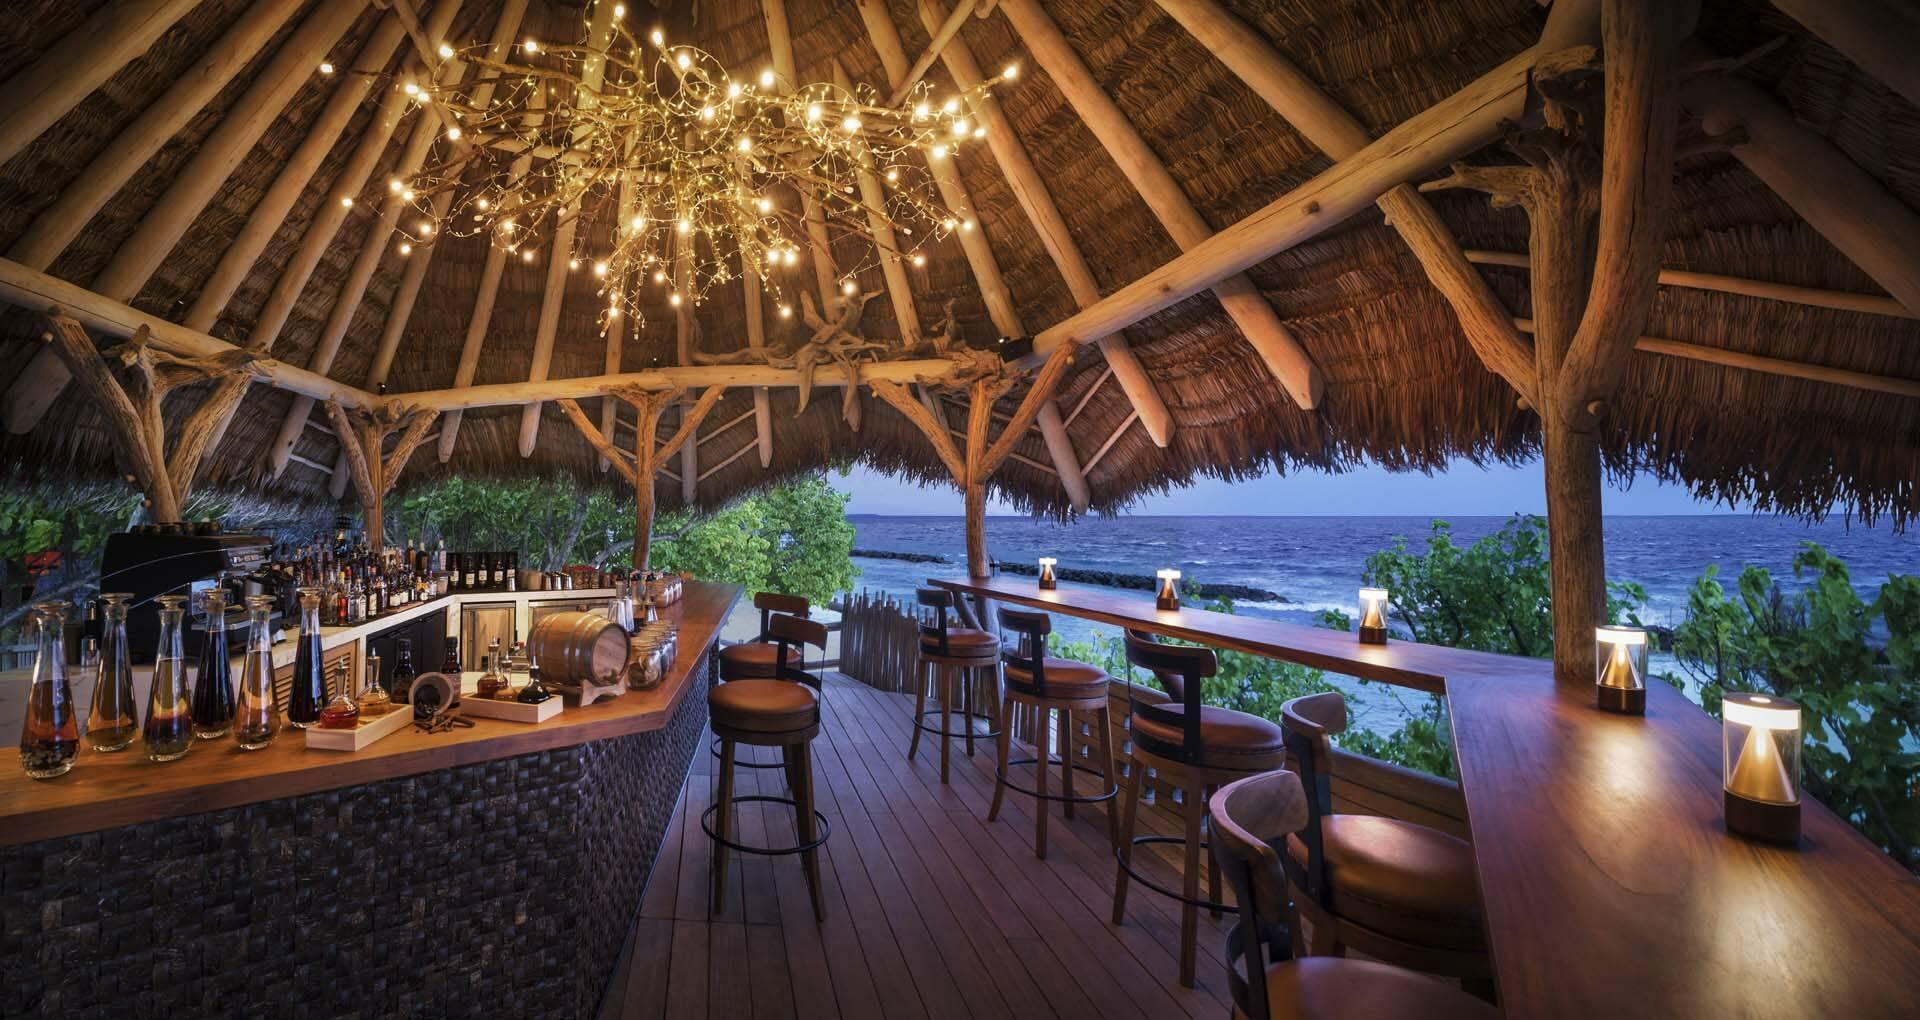 JW Marriott Maldives restaurant nuit